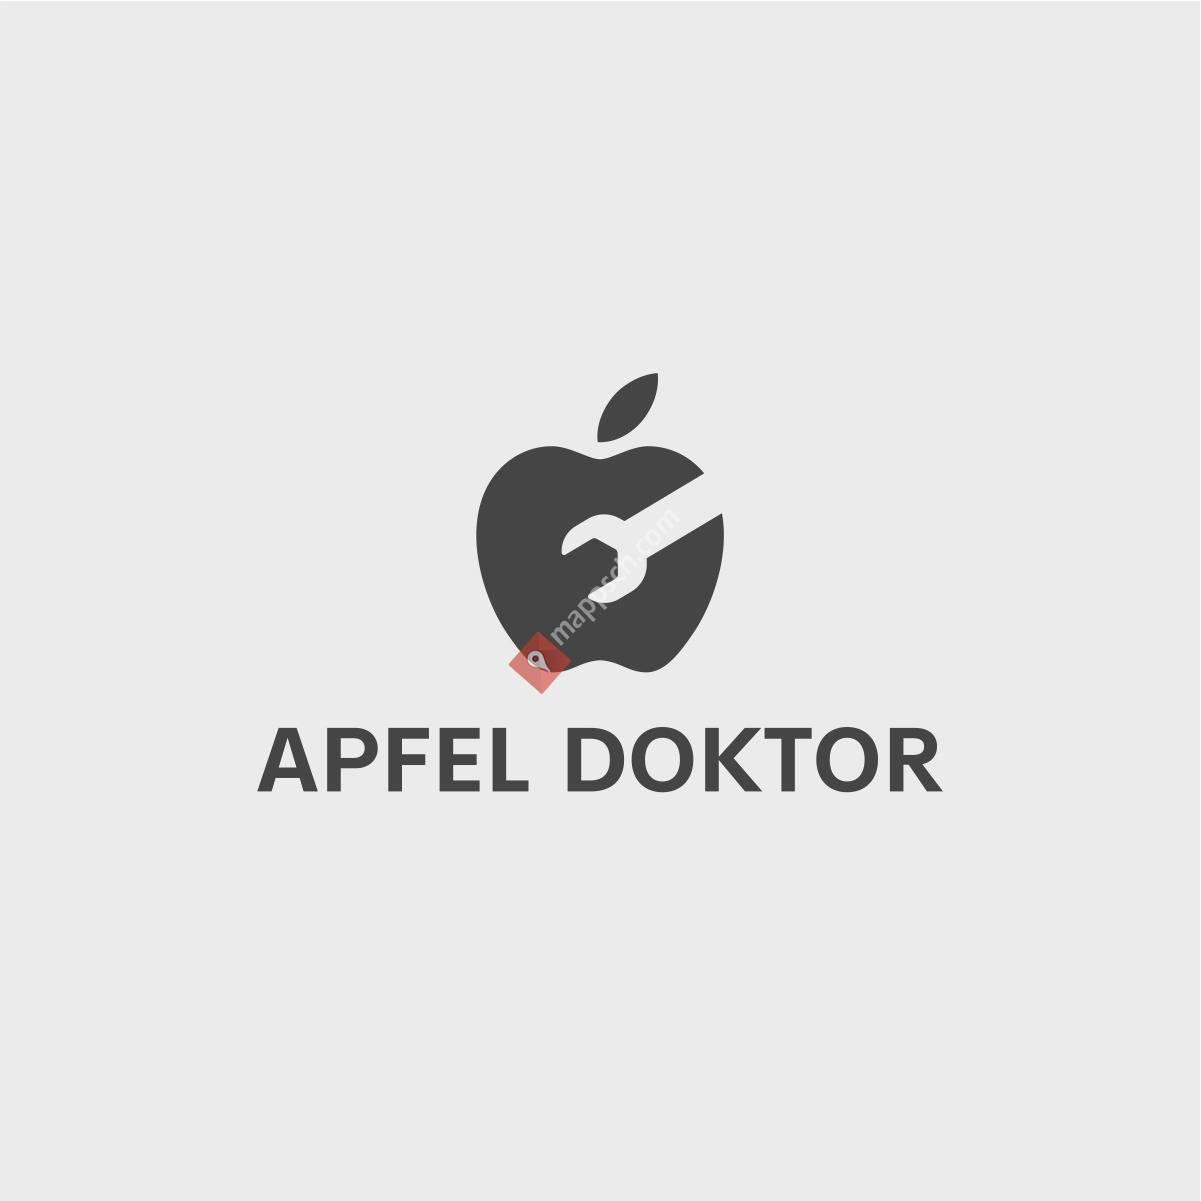 Apfel-Doktor